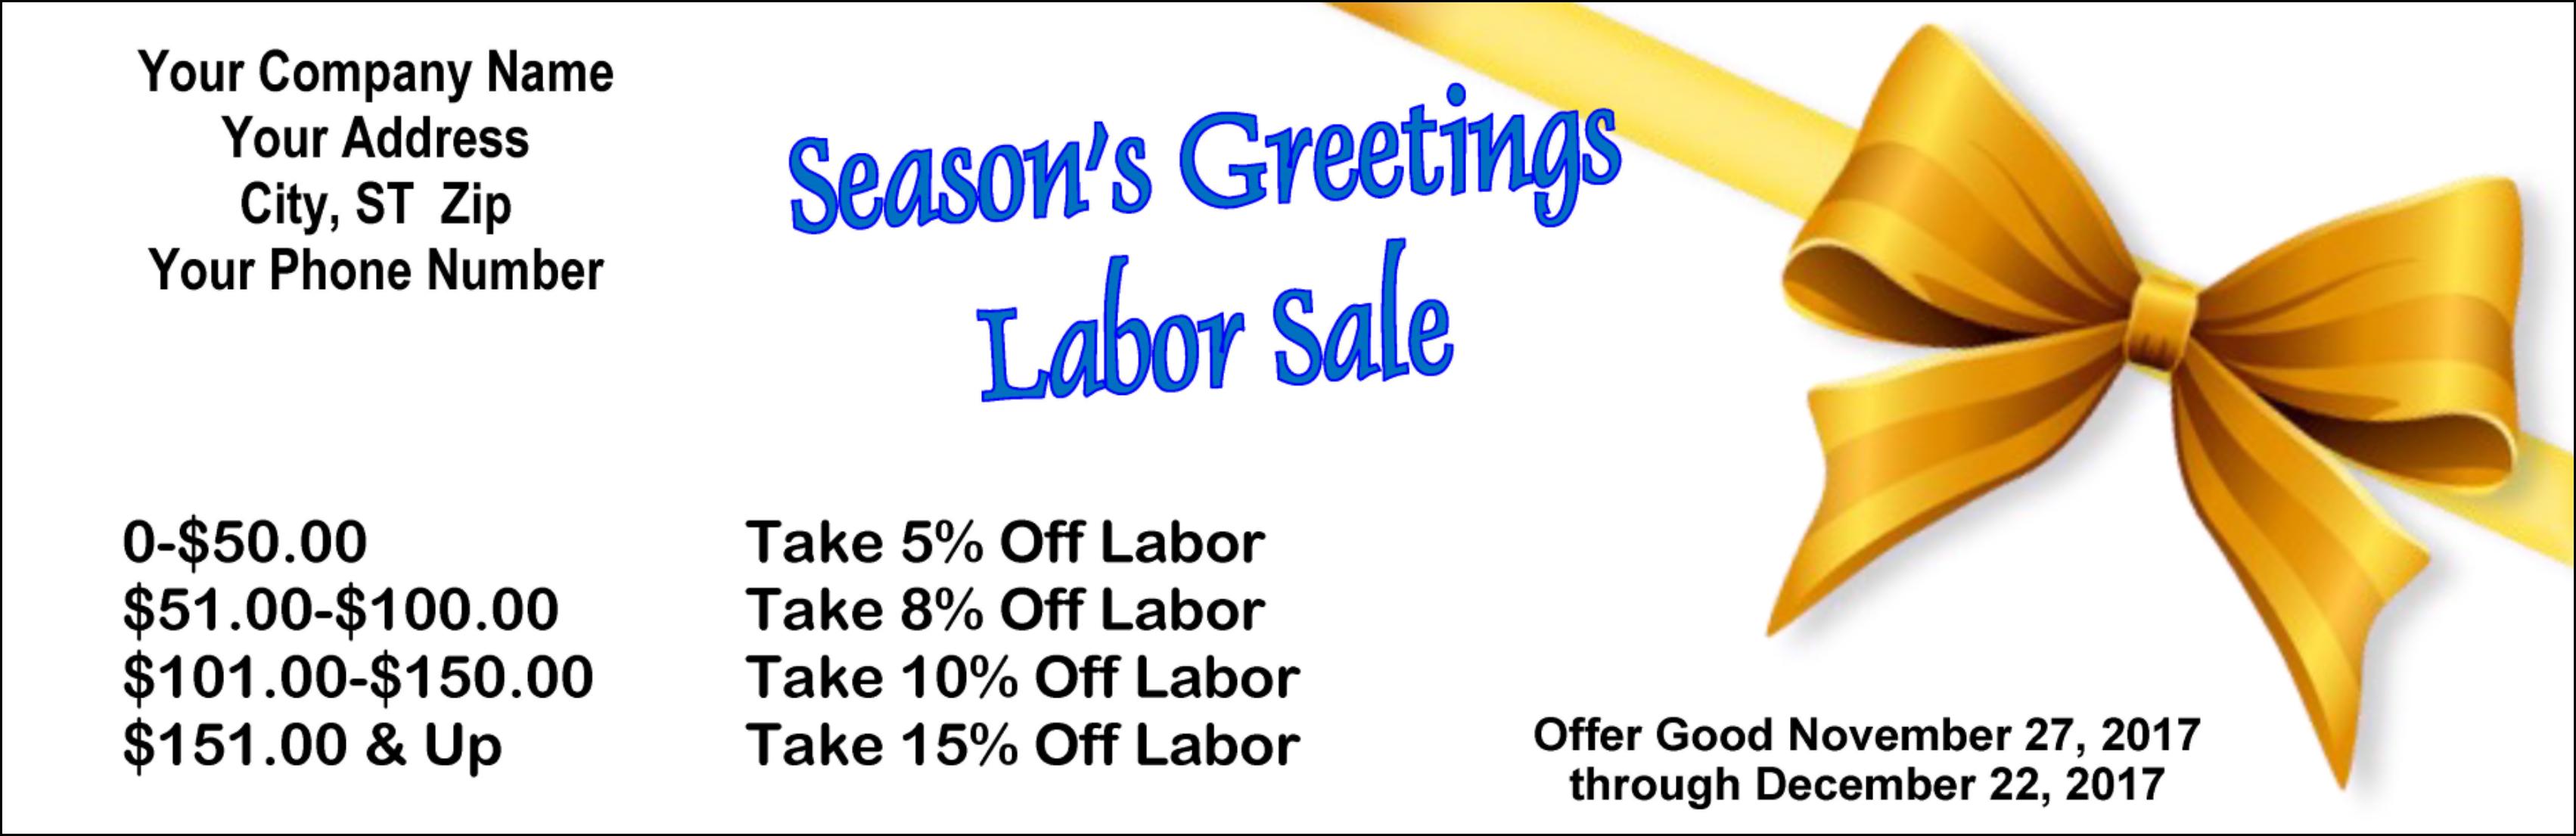 Seasons greeting coupons envelopes creative presse holiday giveaway coupon seasons greetings labor sale coupon kristyandbryce Images